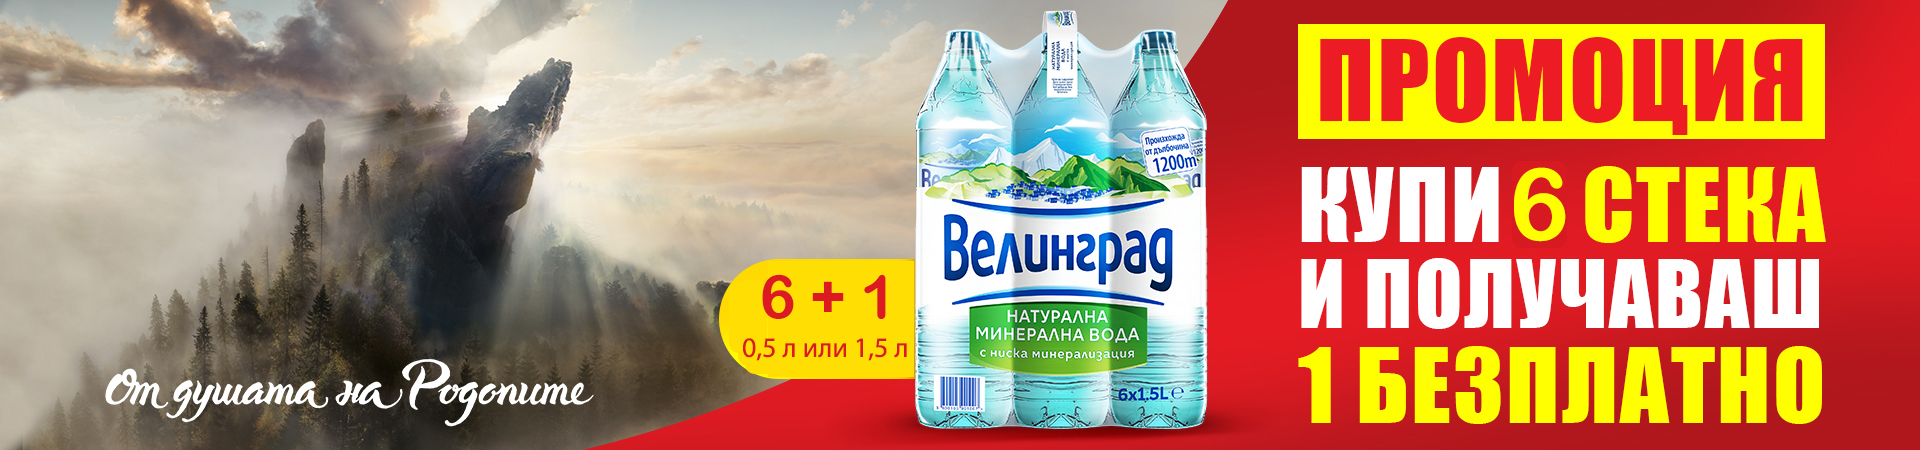 Велинград